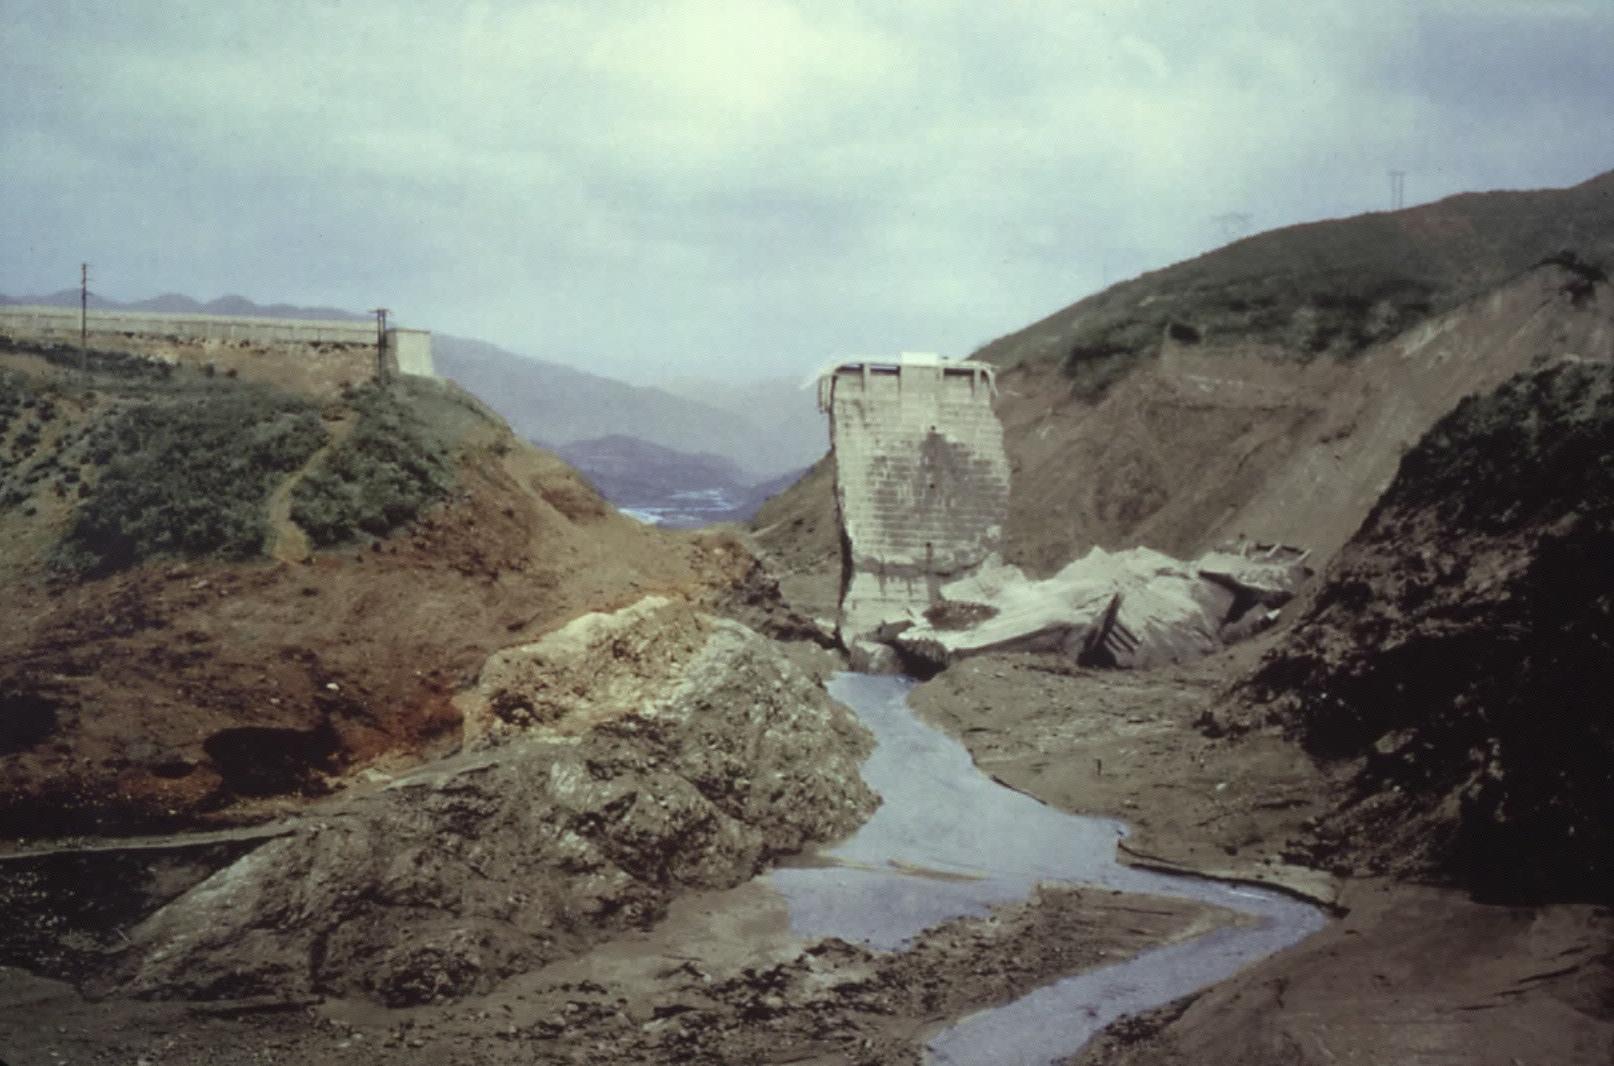 banqiao dam failure - photo #22